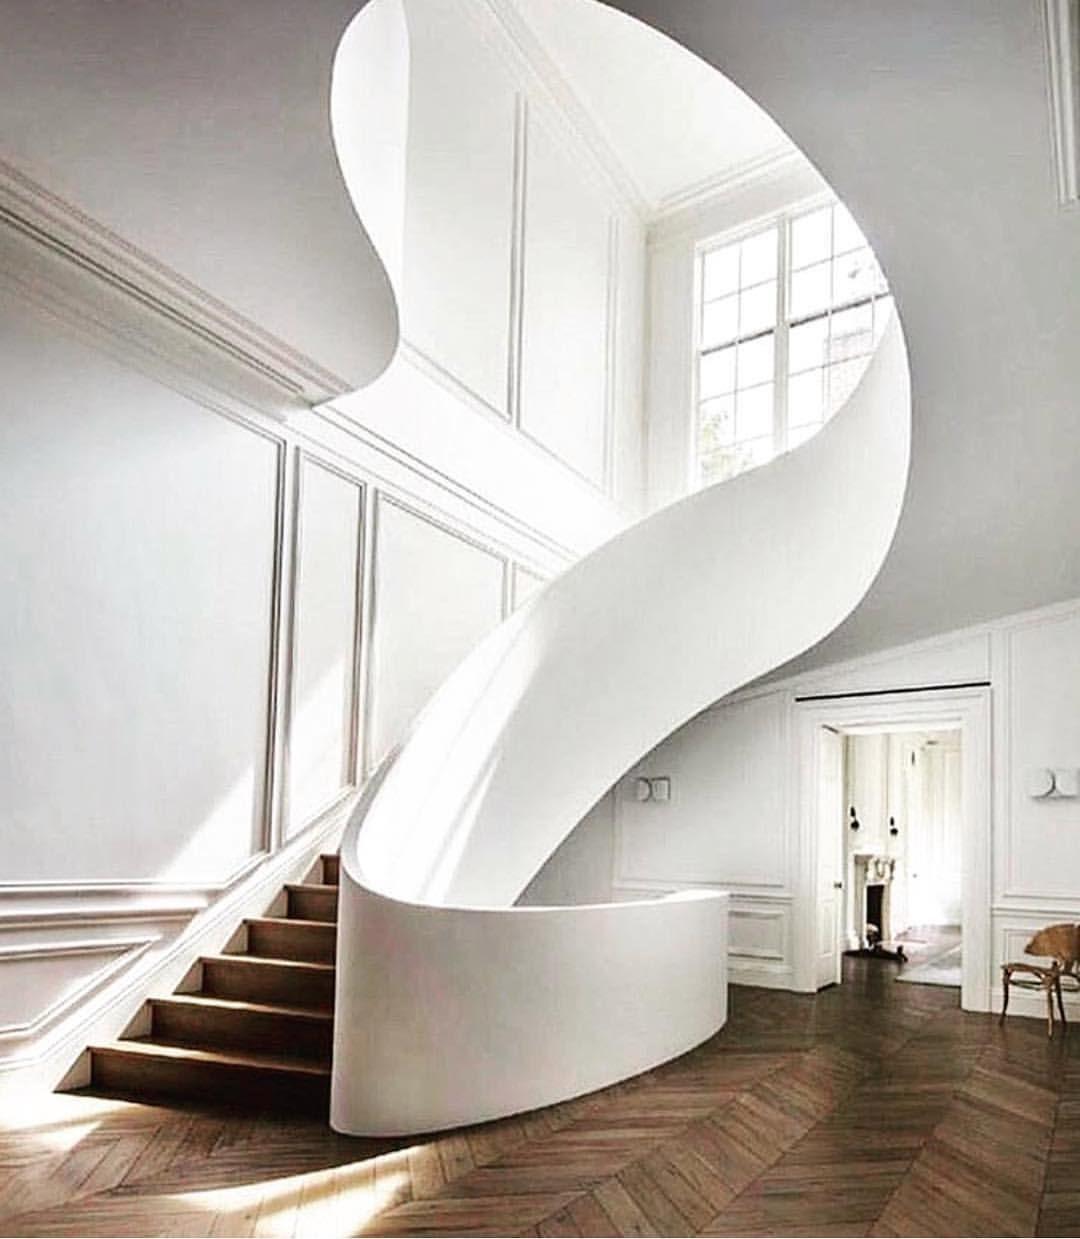 Home Decoration Design Minimalist Interior Design Staircase: Elegant, Sweeping Staircase #staircase #minimaldesign In